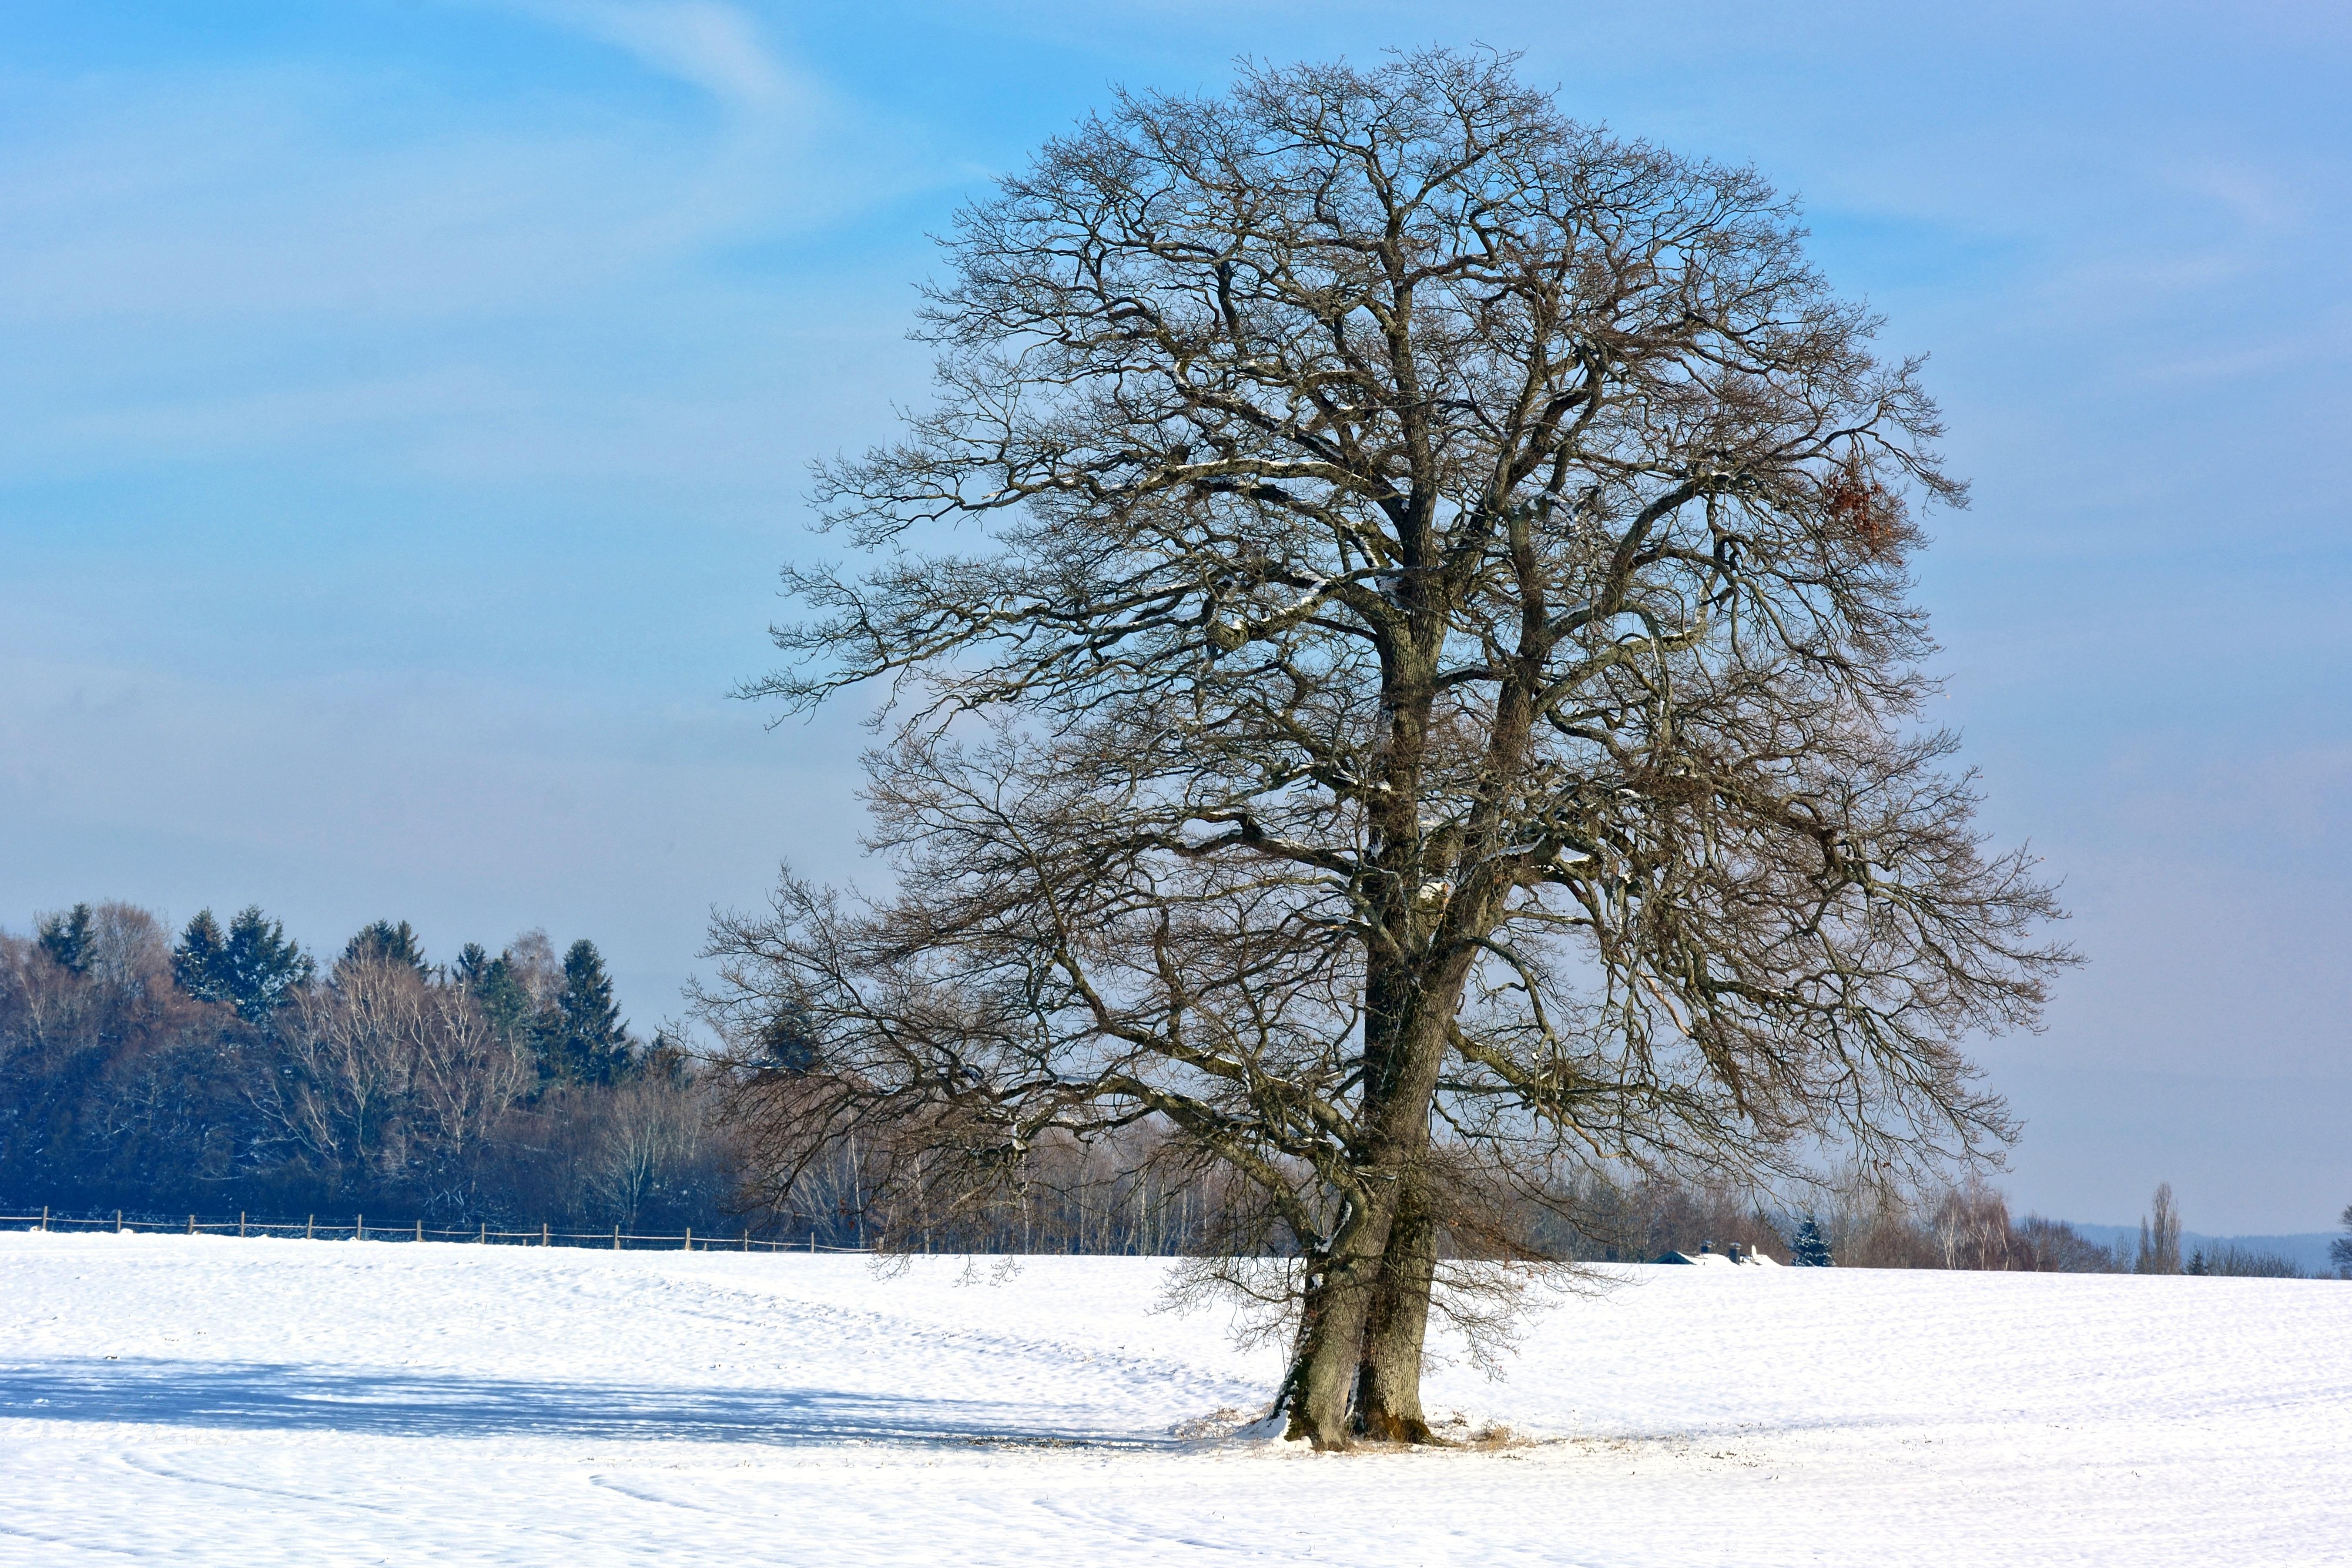 картинка дерево зимой без снега картина этого